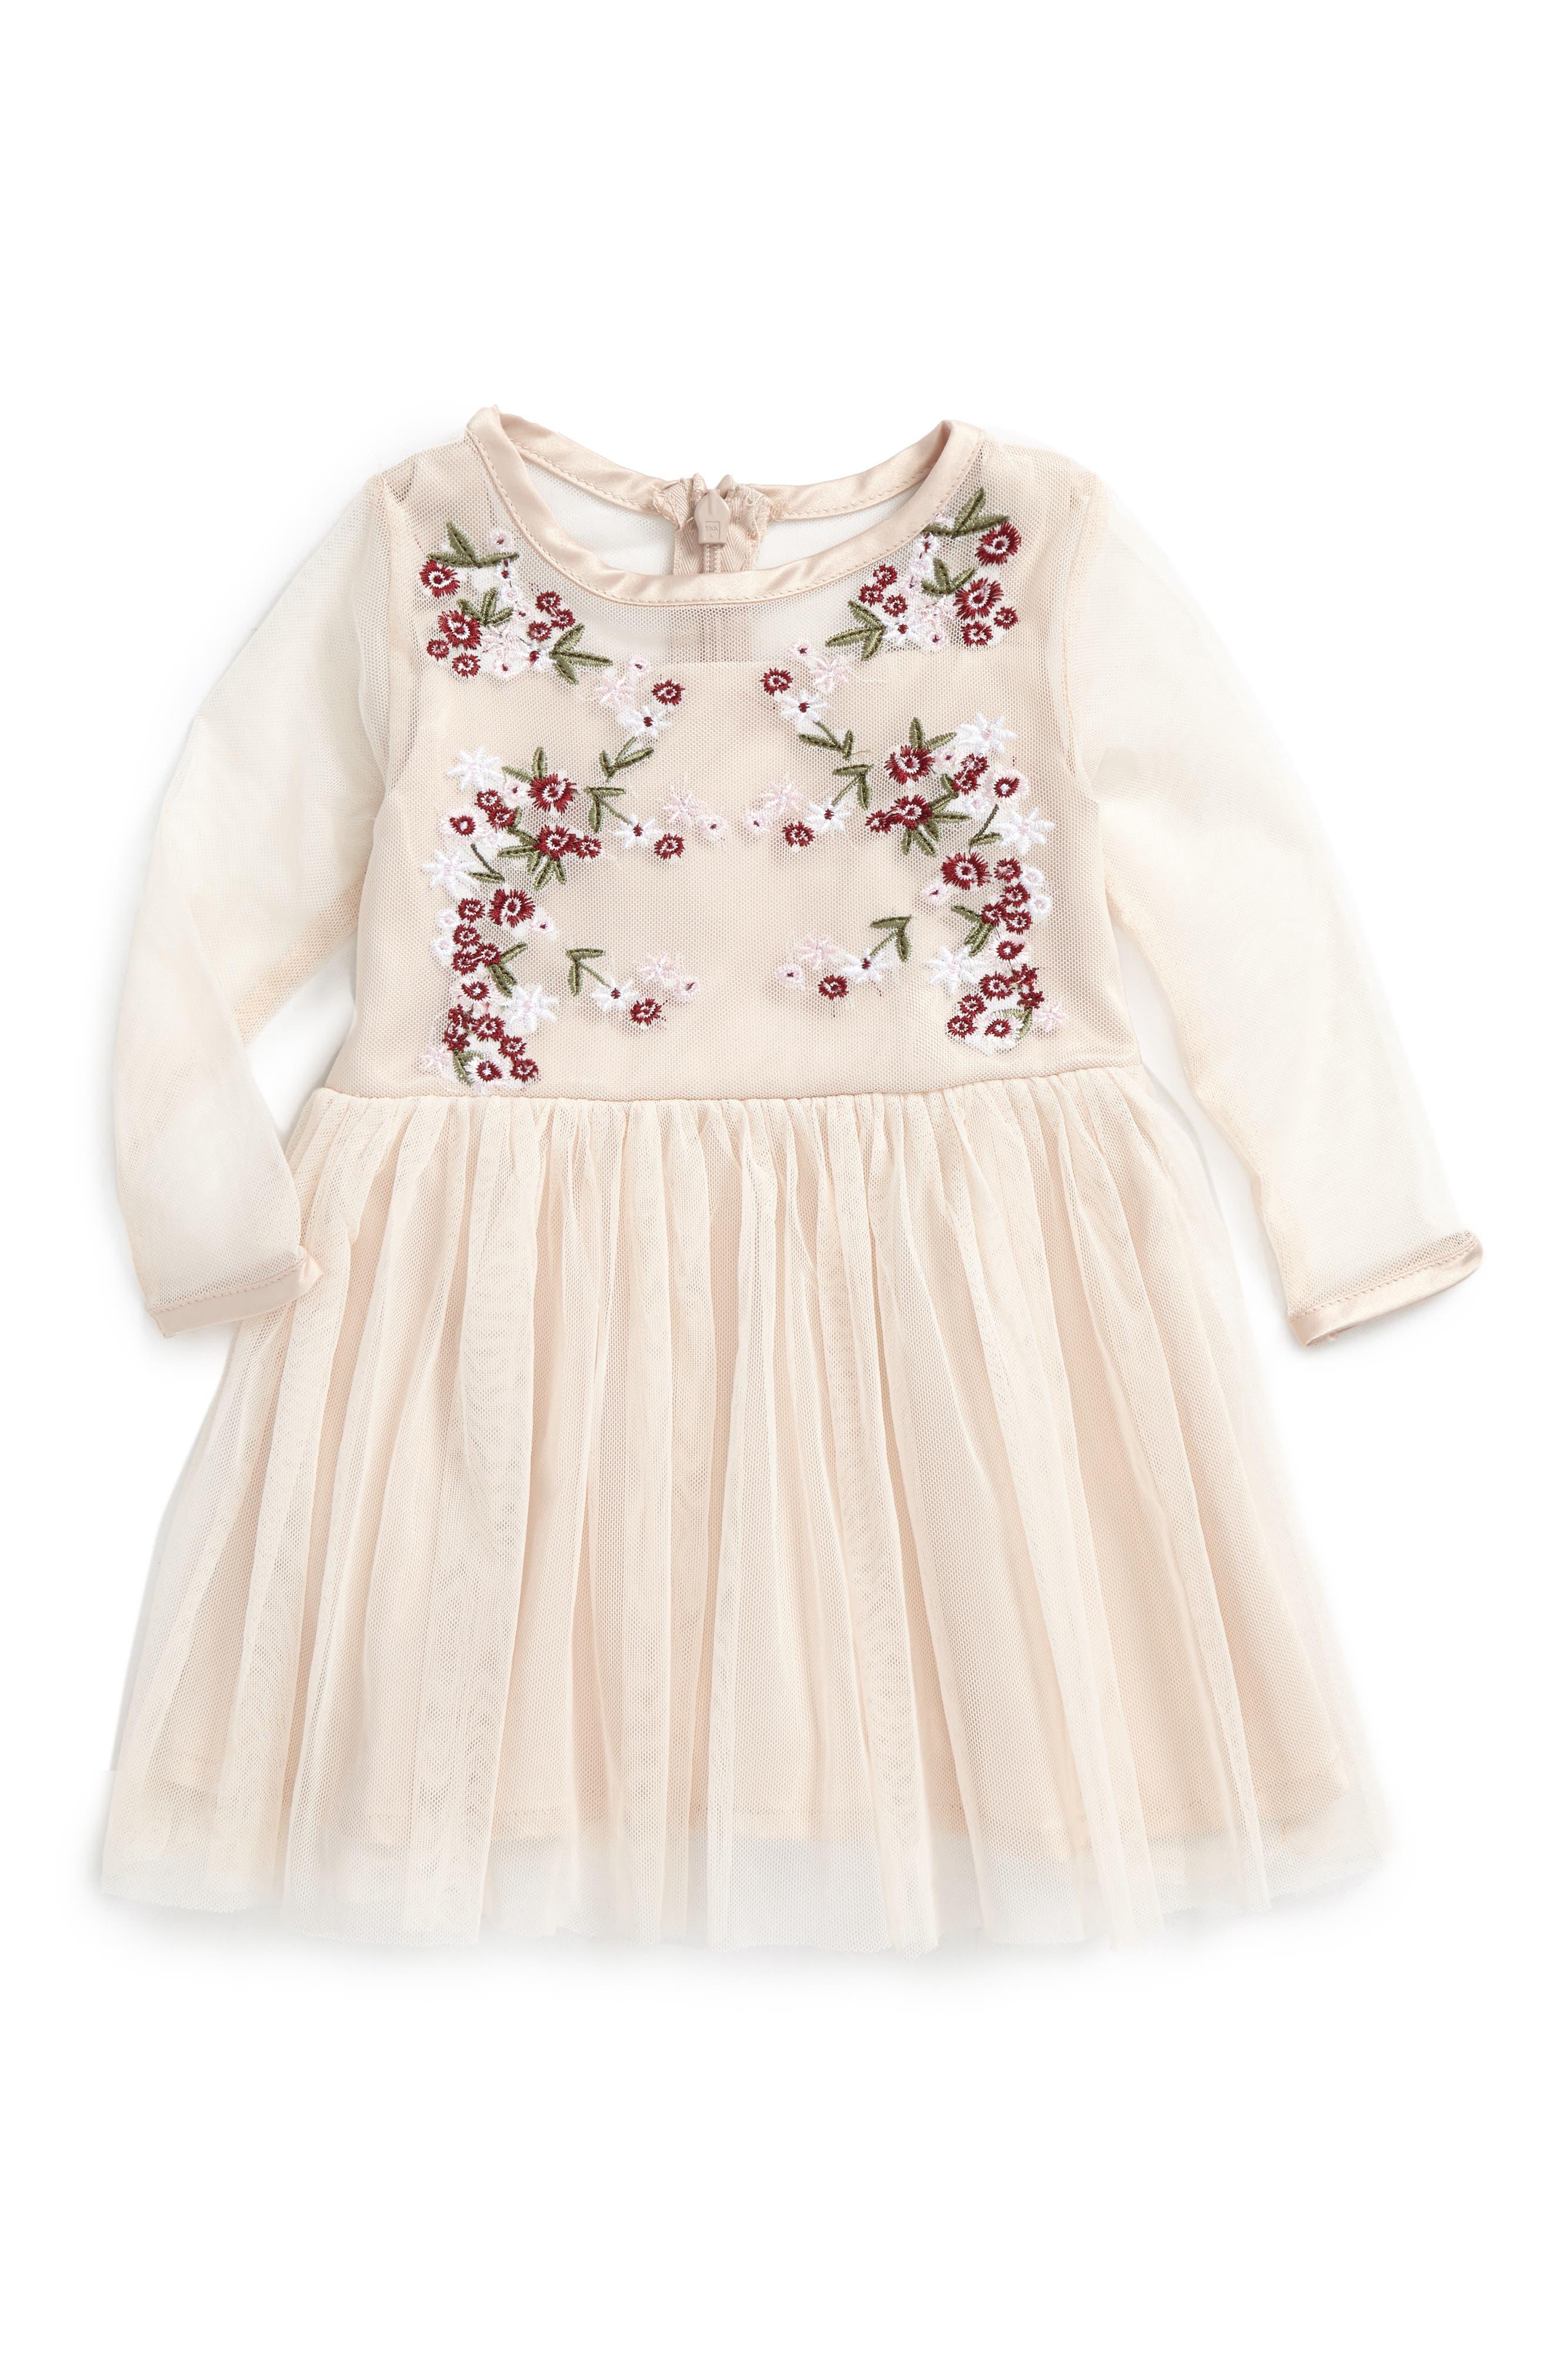 Annabelle Dress,                             Main thumbnail 1, color,                             650